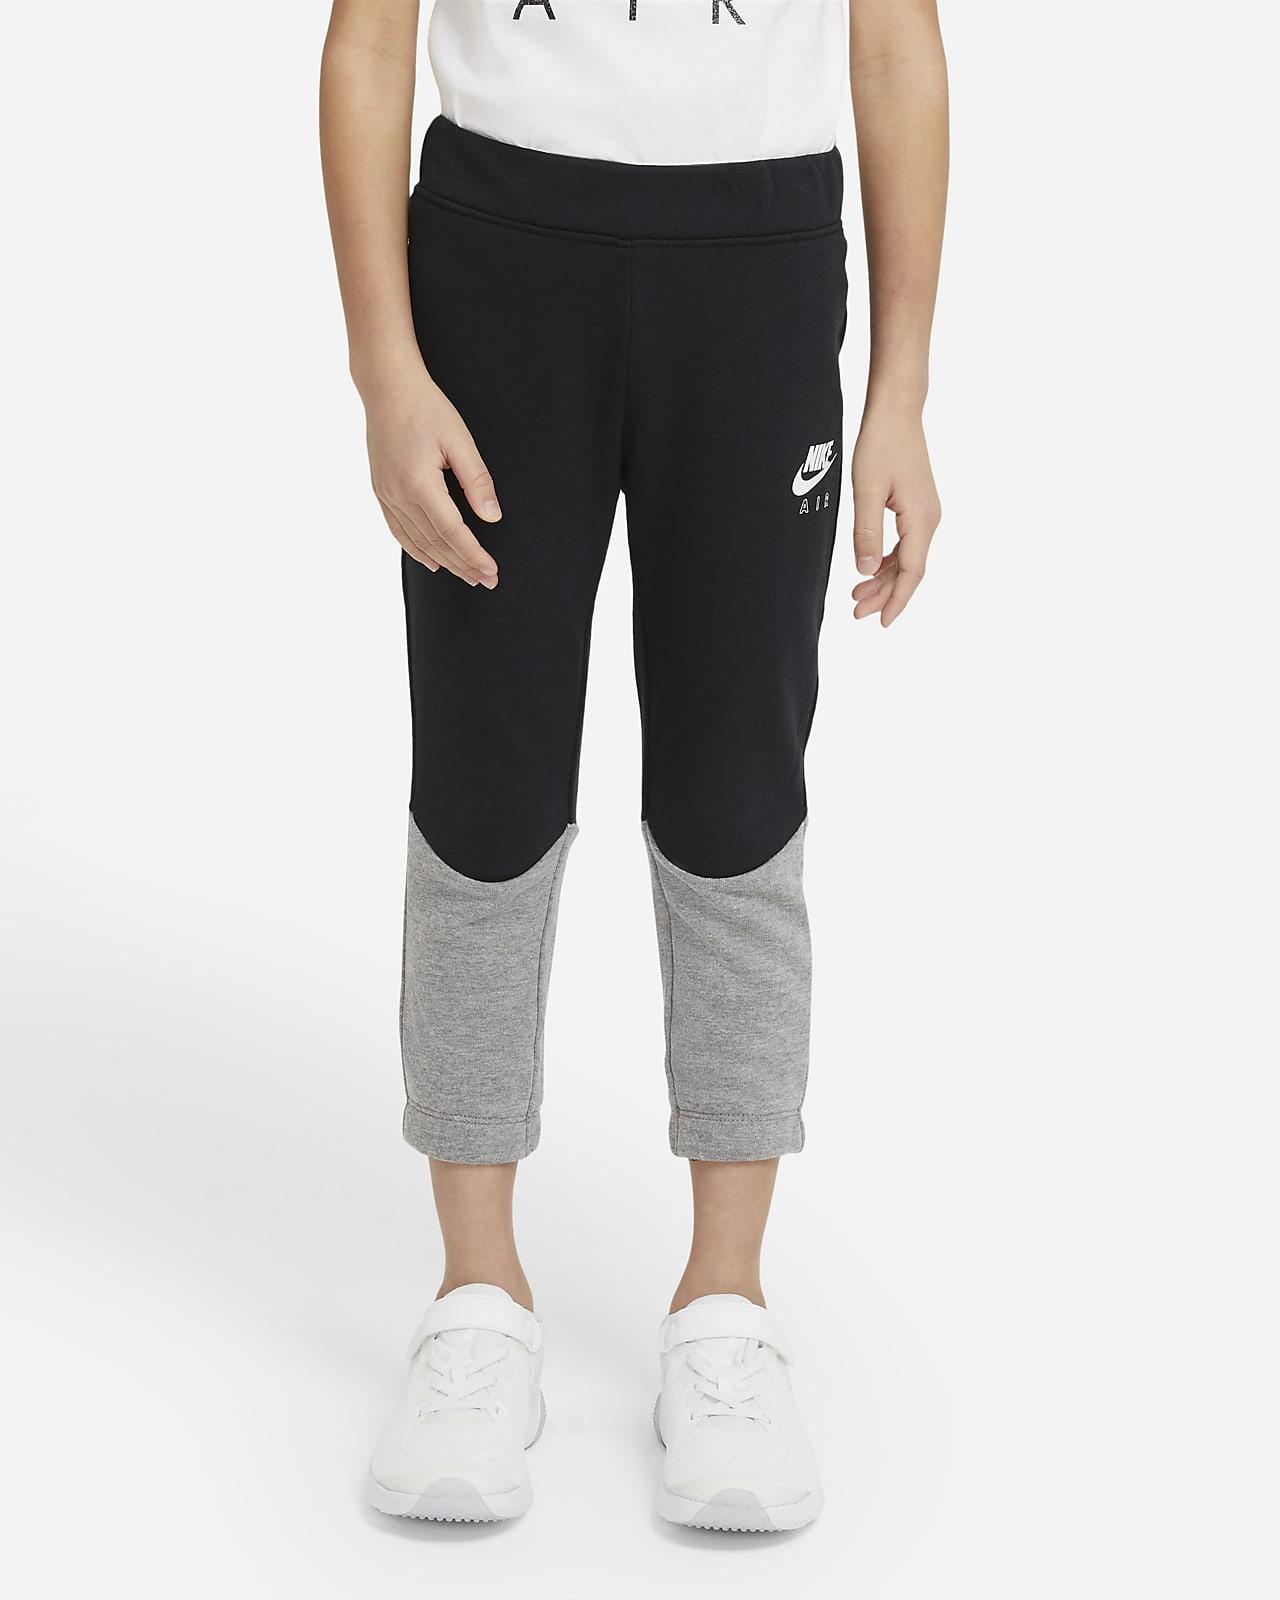 Nike Air Little Kids' Pants